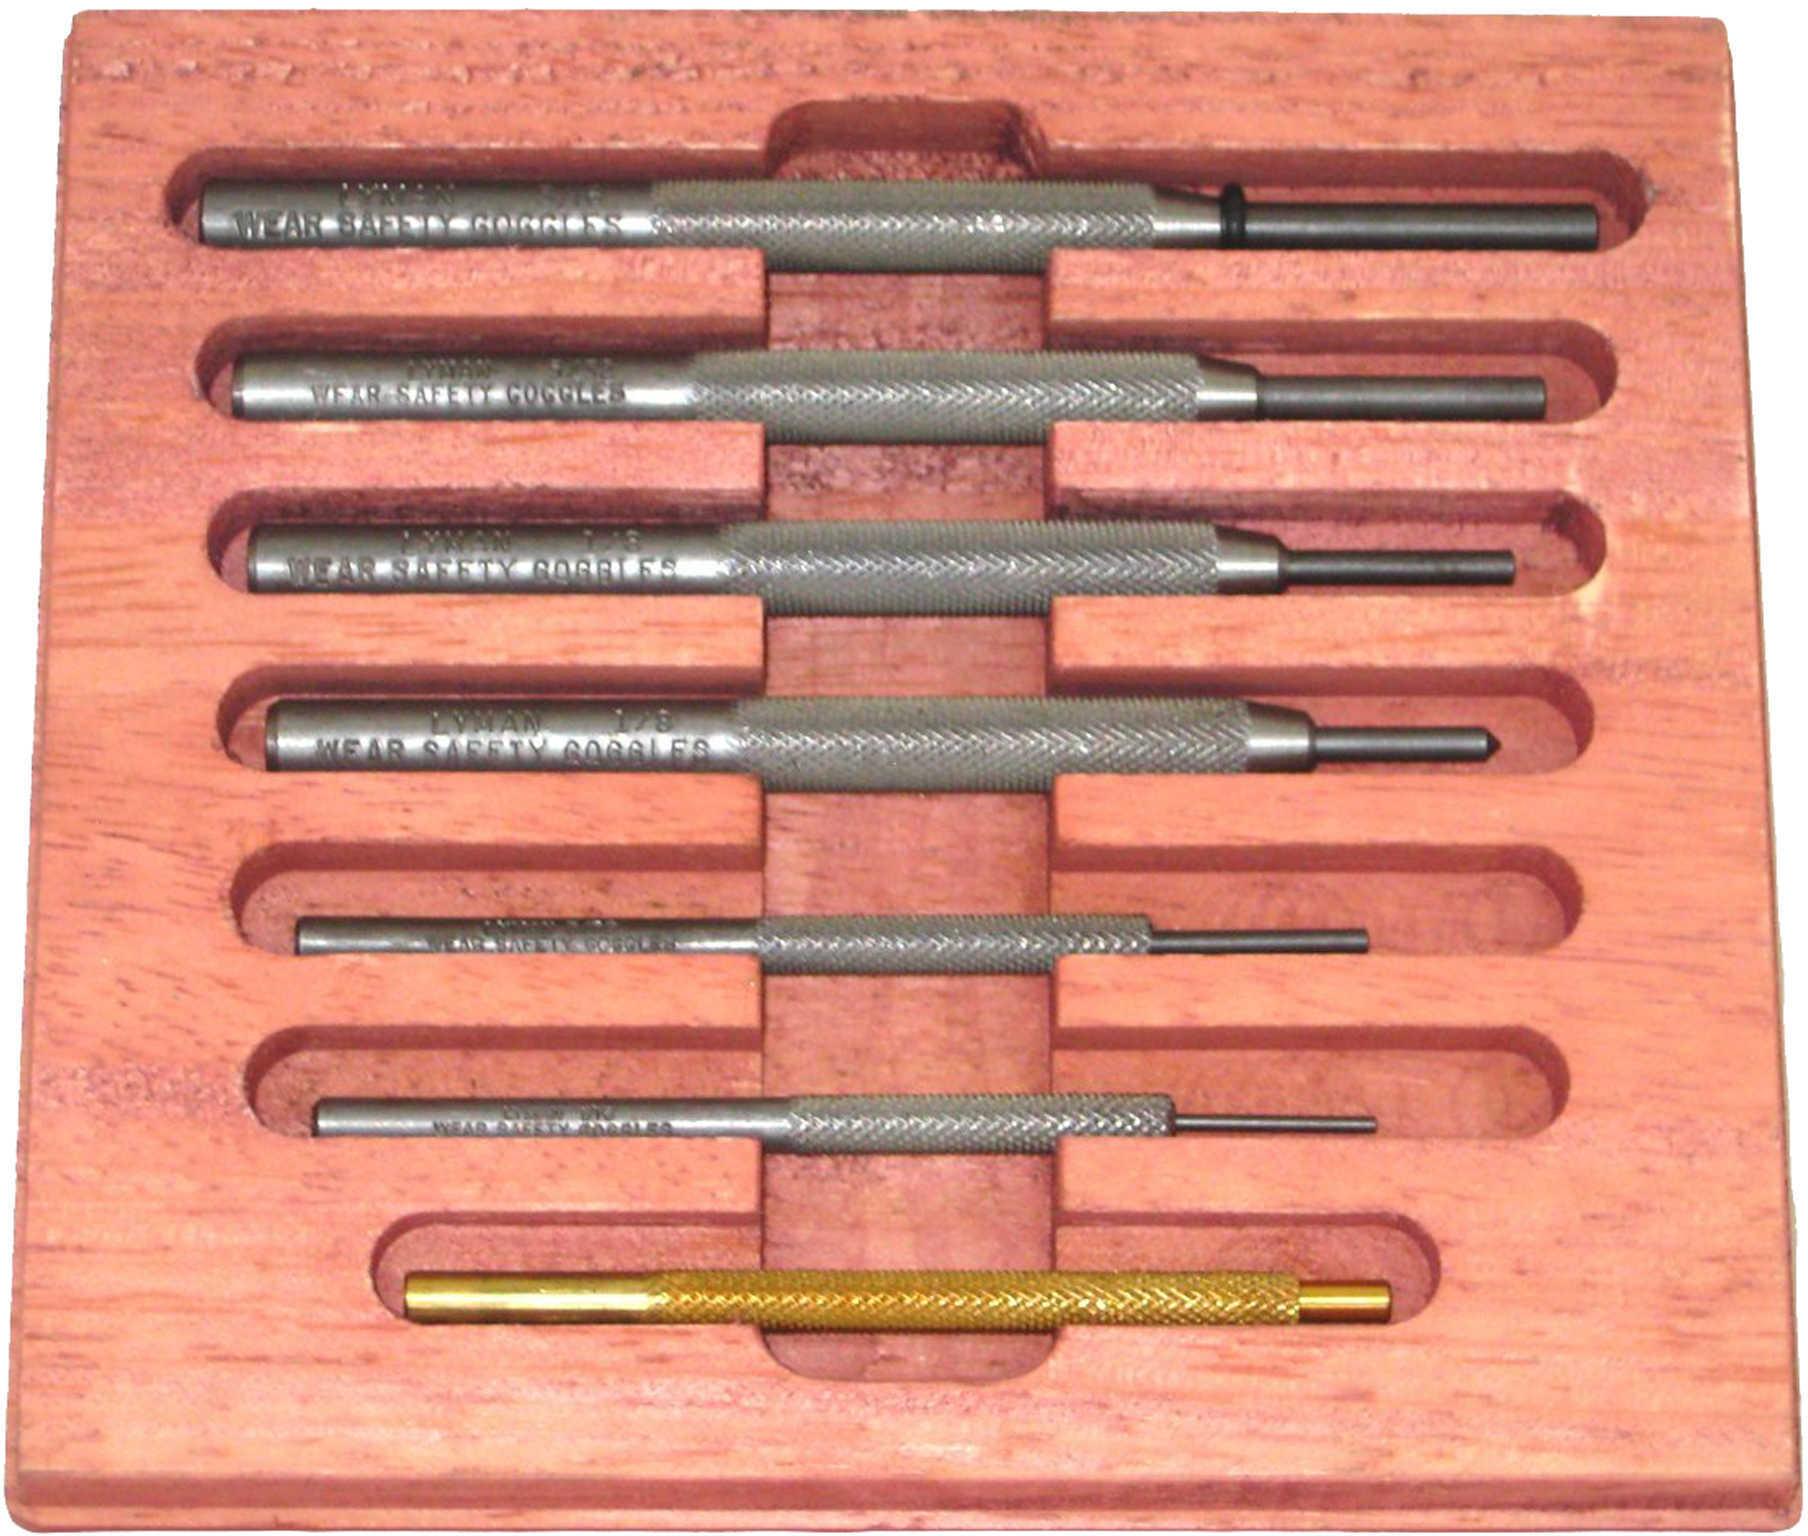 Lyman Gunsmith Punch Set 7031273